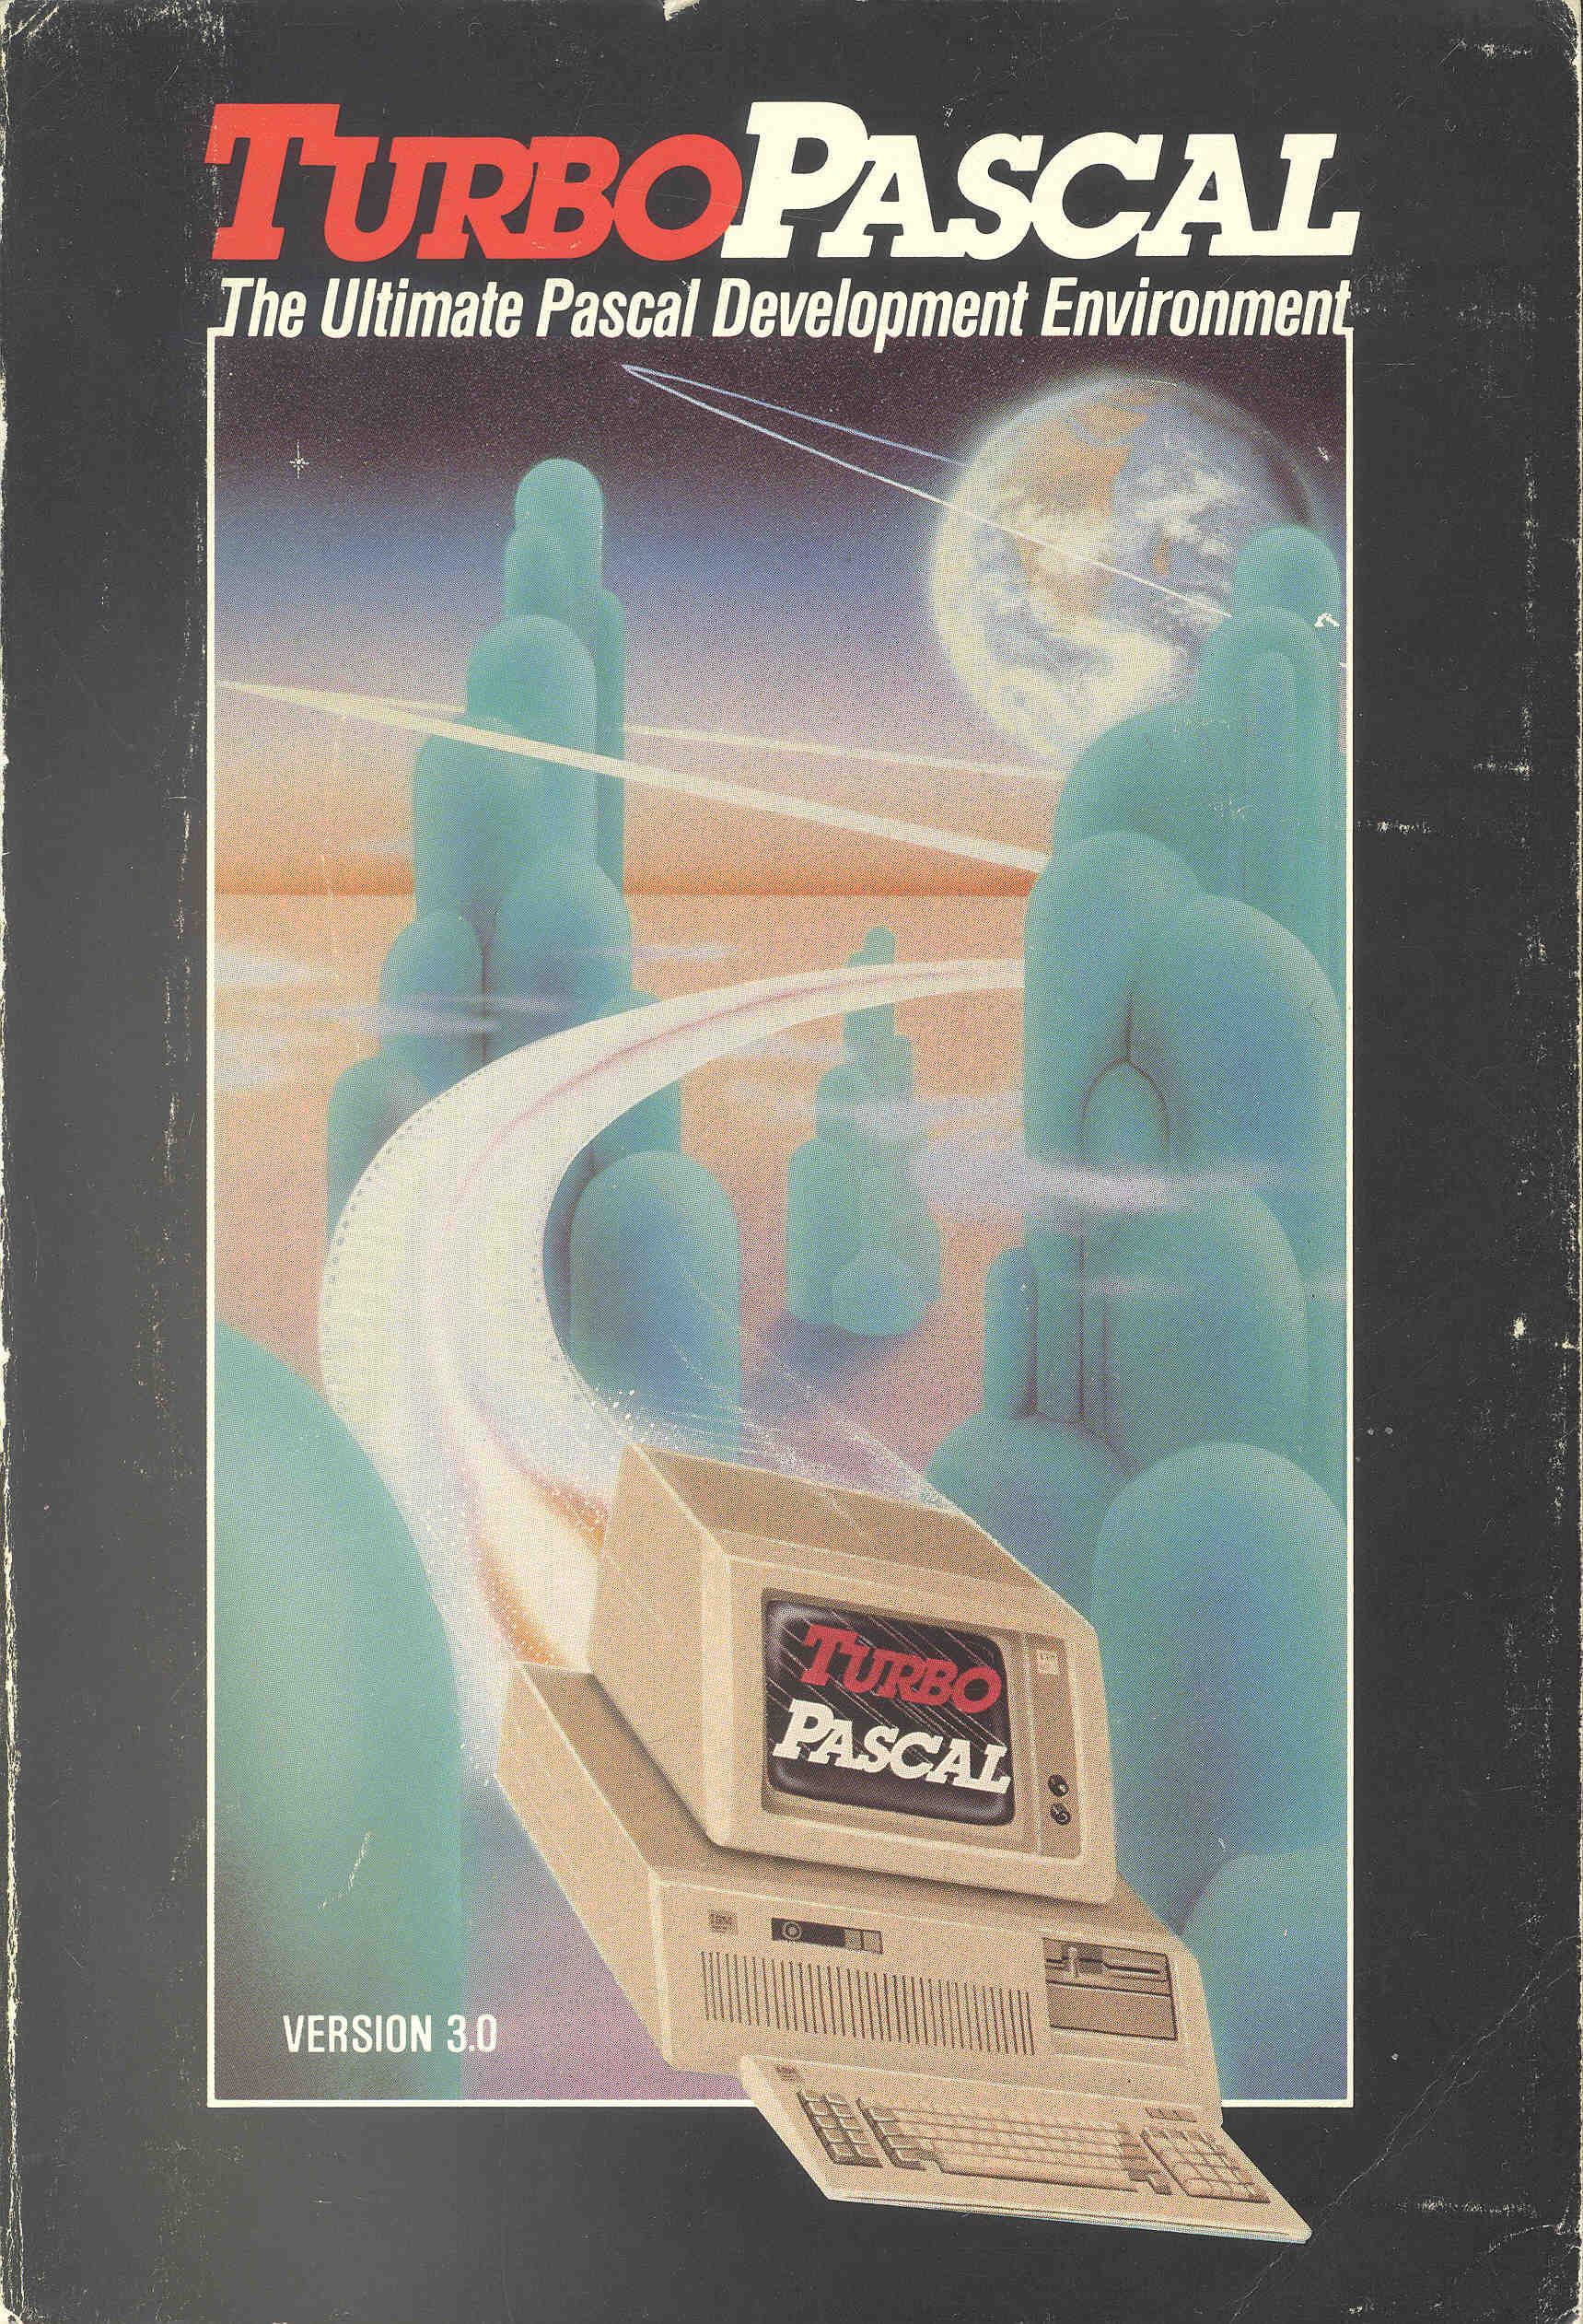 Turbo Pascal 7 for Windows 7 /1 & Windows 10 [32bit